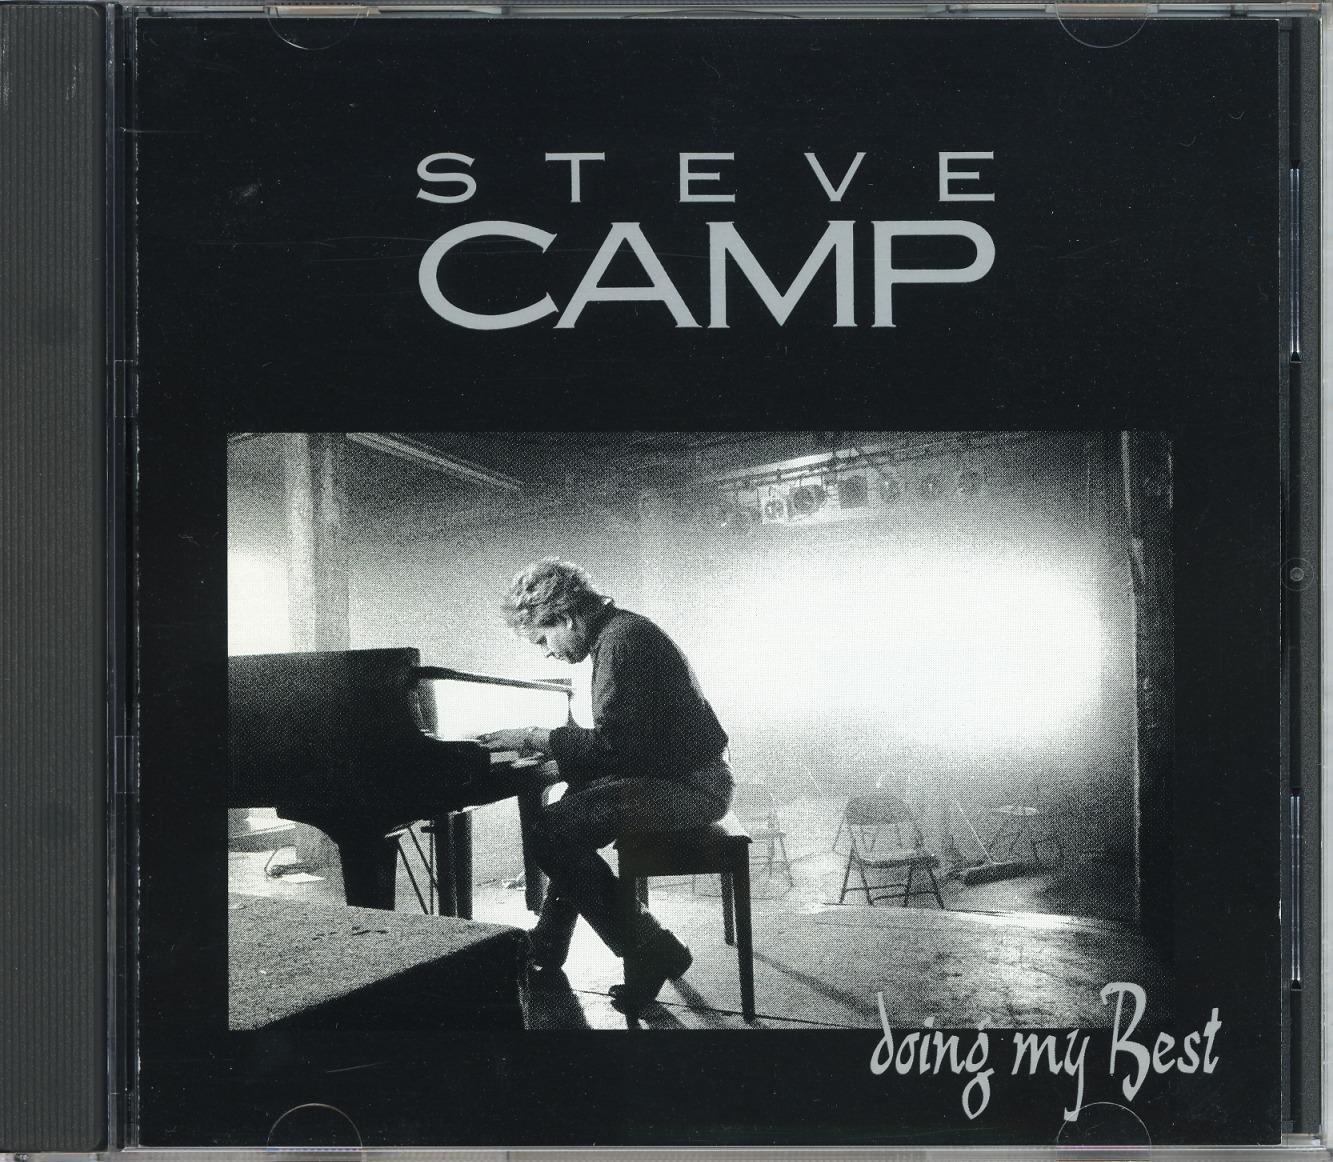 STEVE CAMP/DOING MY BEST (USED)